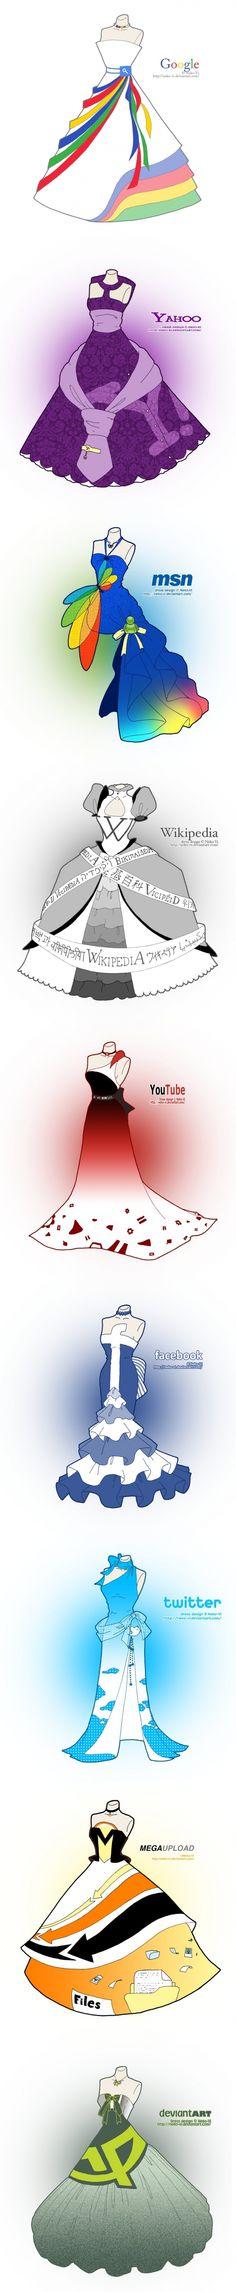 #websites meet #fashion? Popular websites re-imagined as dresses. :) (see the artists gallery for more sites, including Pinterest: http://neko-vi.deviantart.com/gallery/36793491)